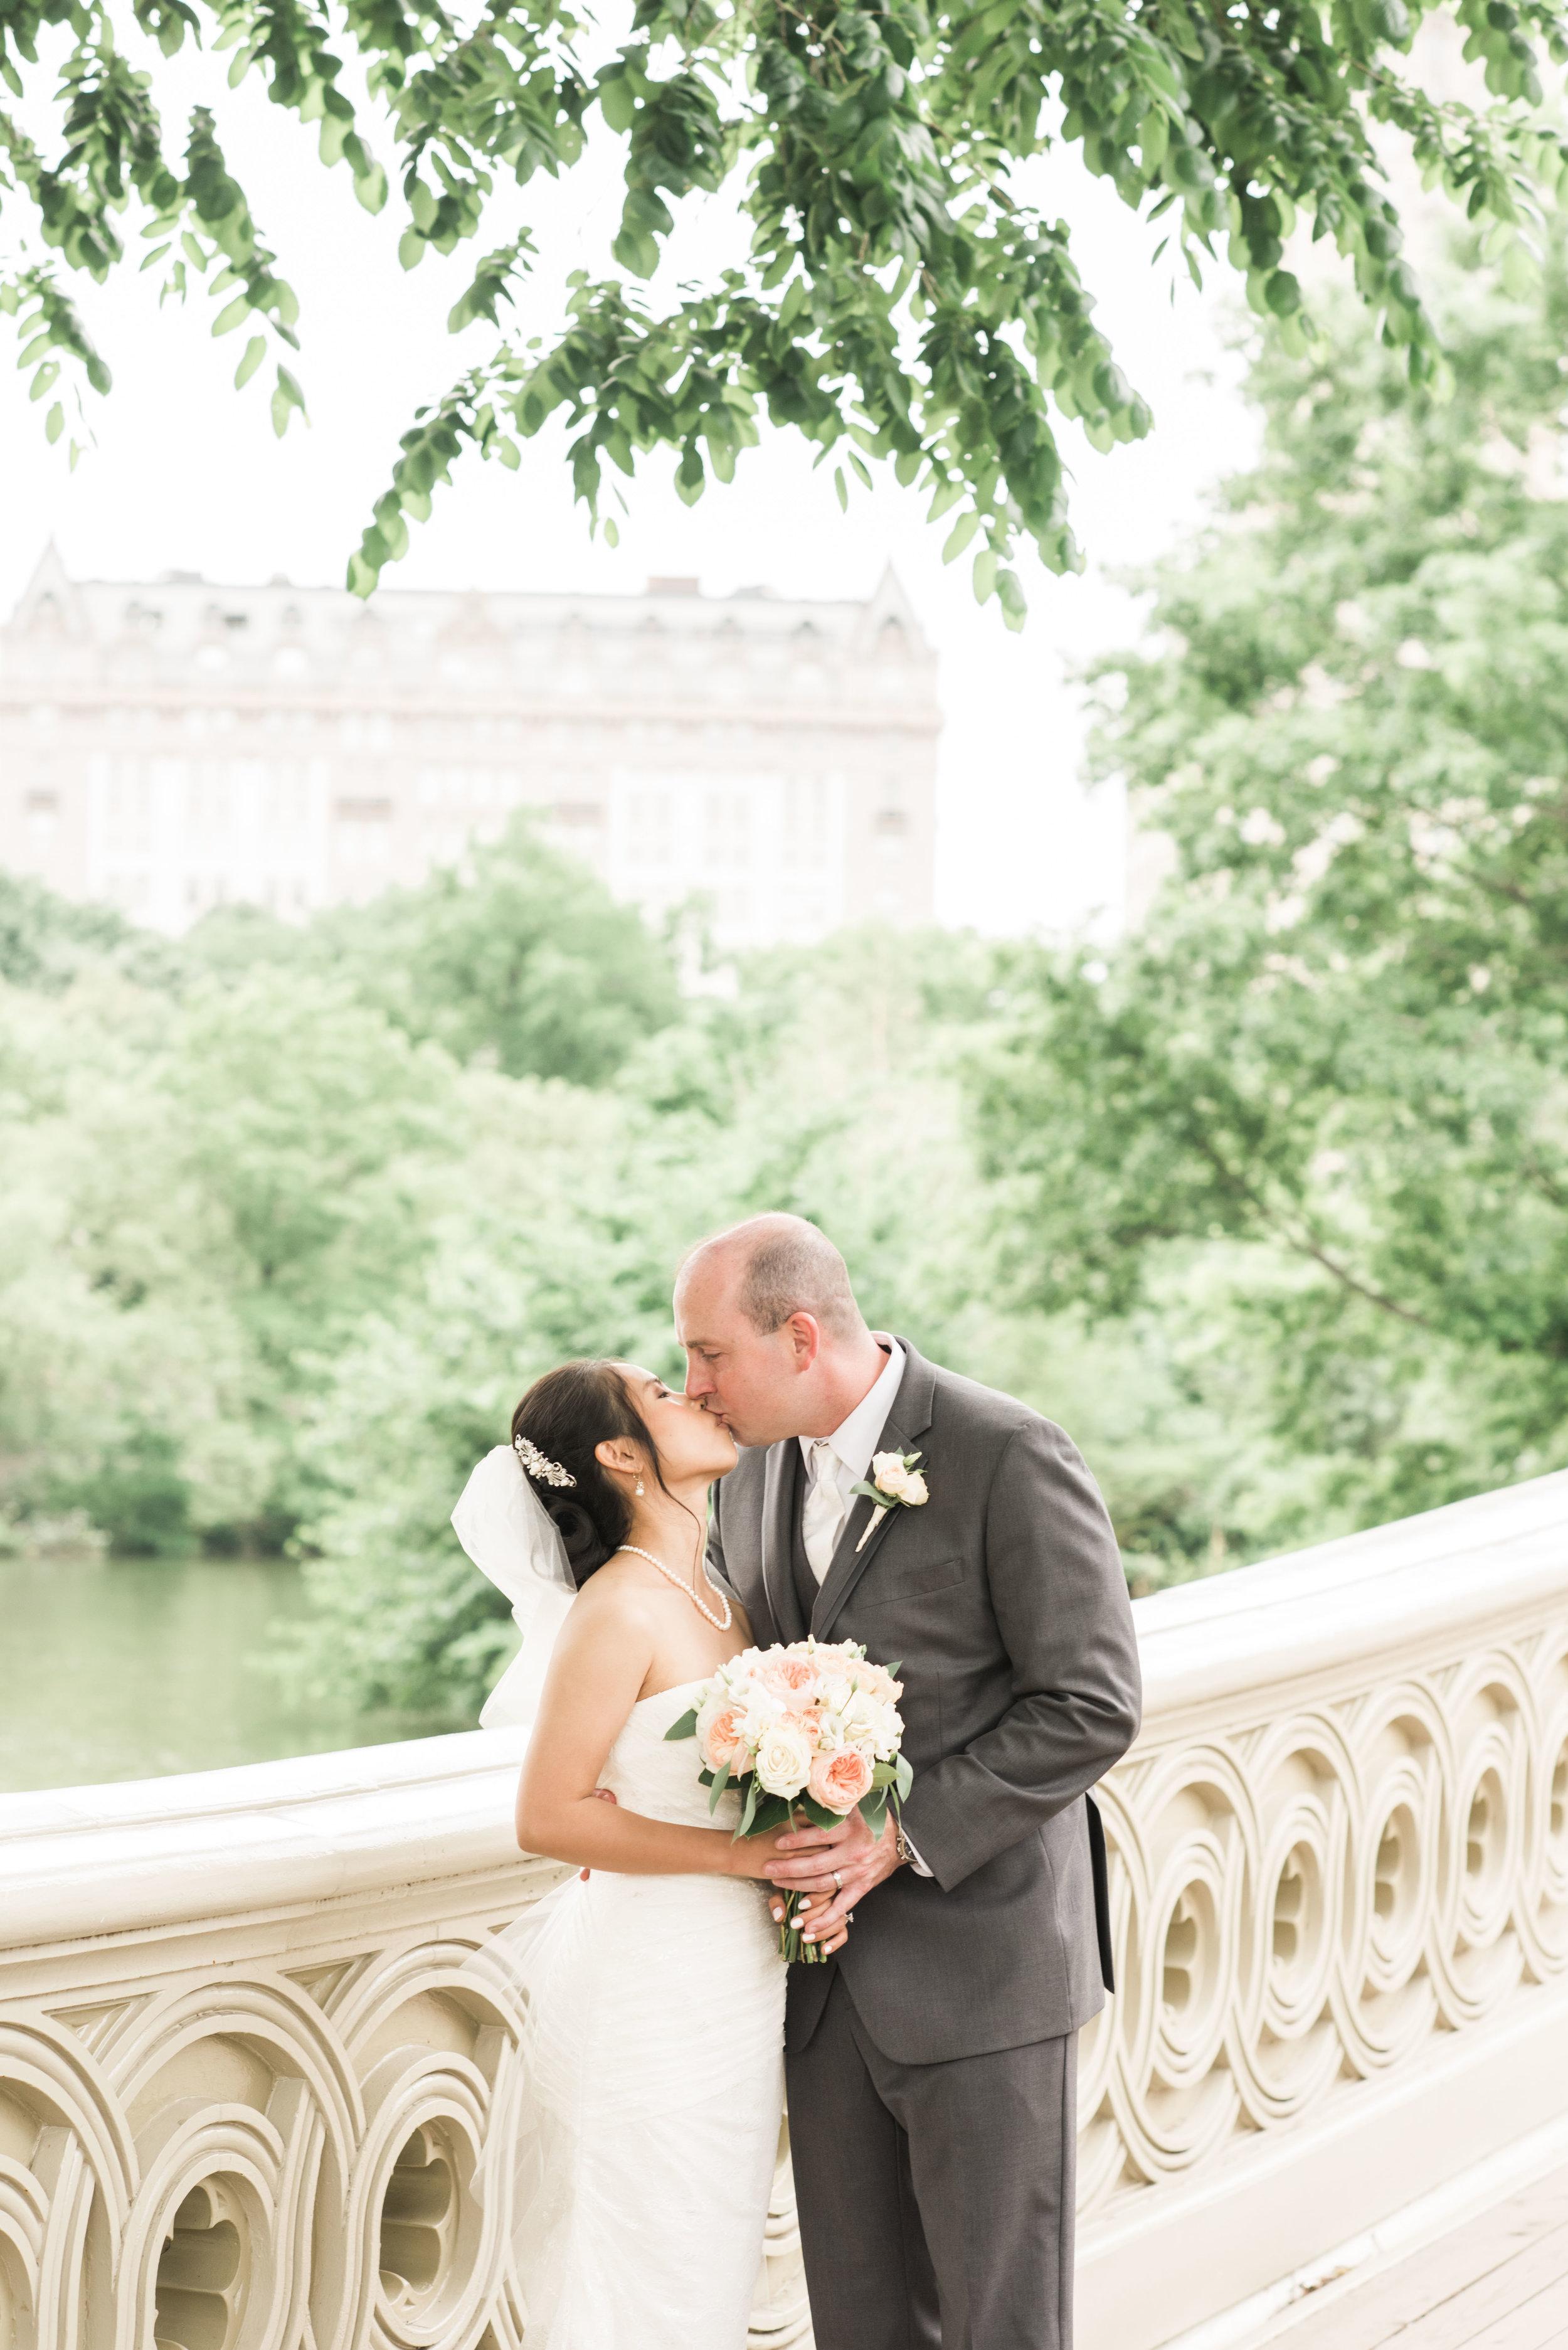 Bow Bridge Wedding, Bride and Groom kissing on bow bridge, bow bridge, central park wedding, bride and groom kissing, destination wedding